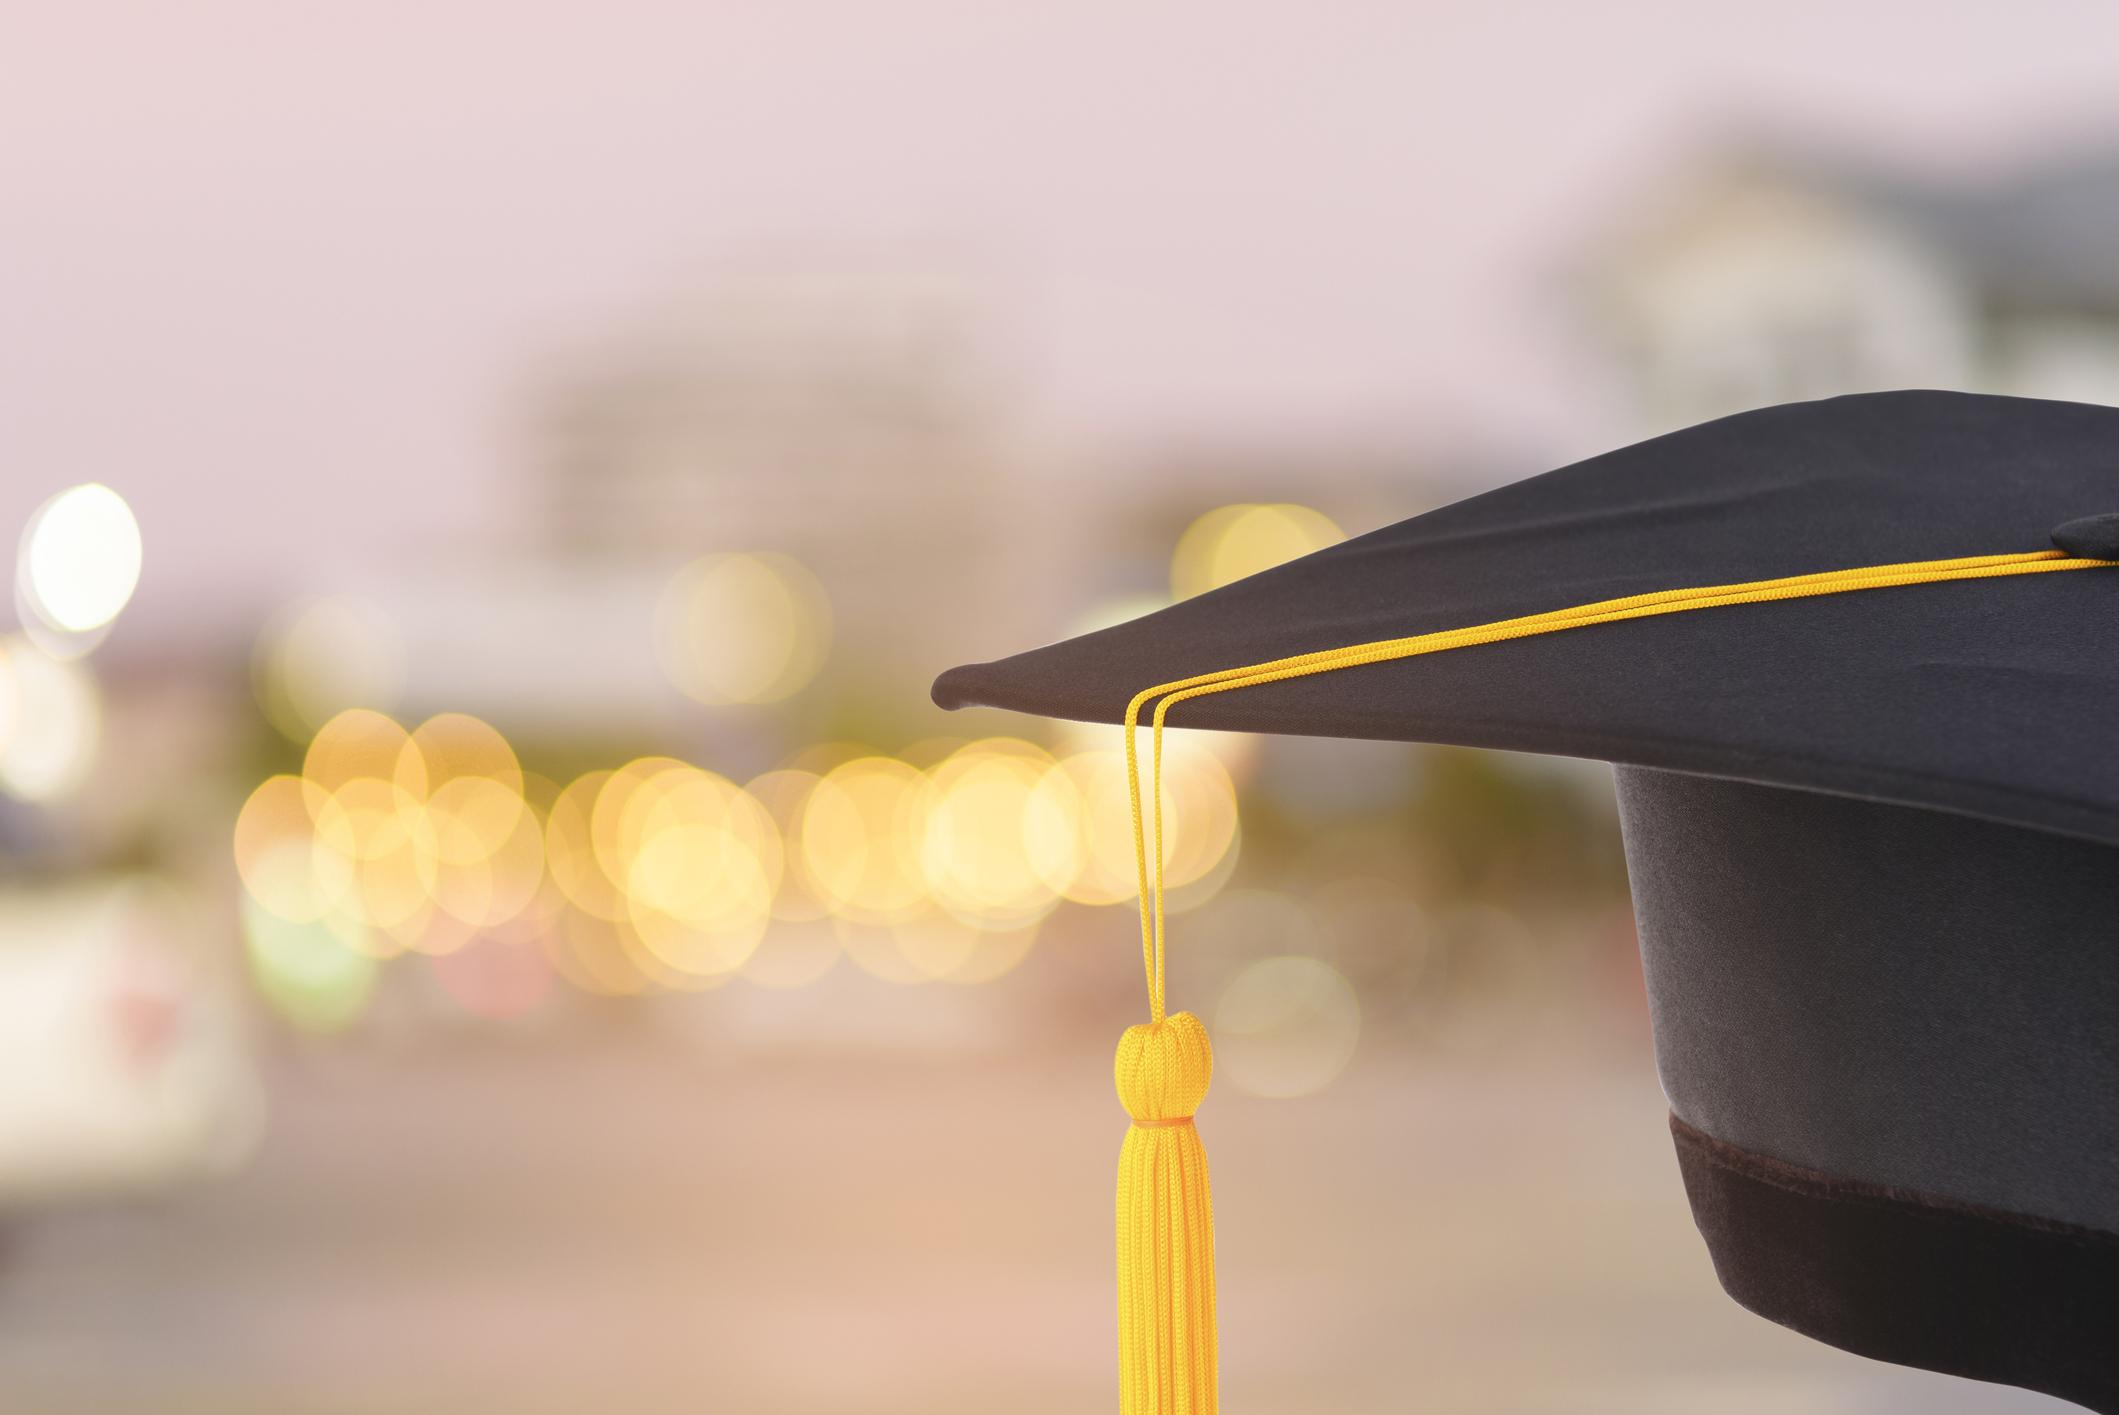 Tips for Using Pinterest for Graduation Planning